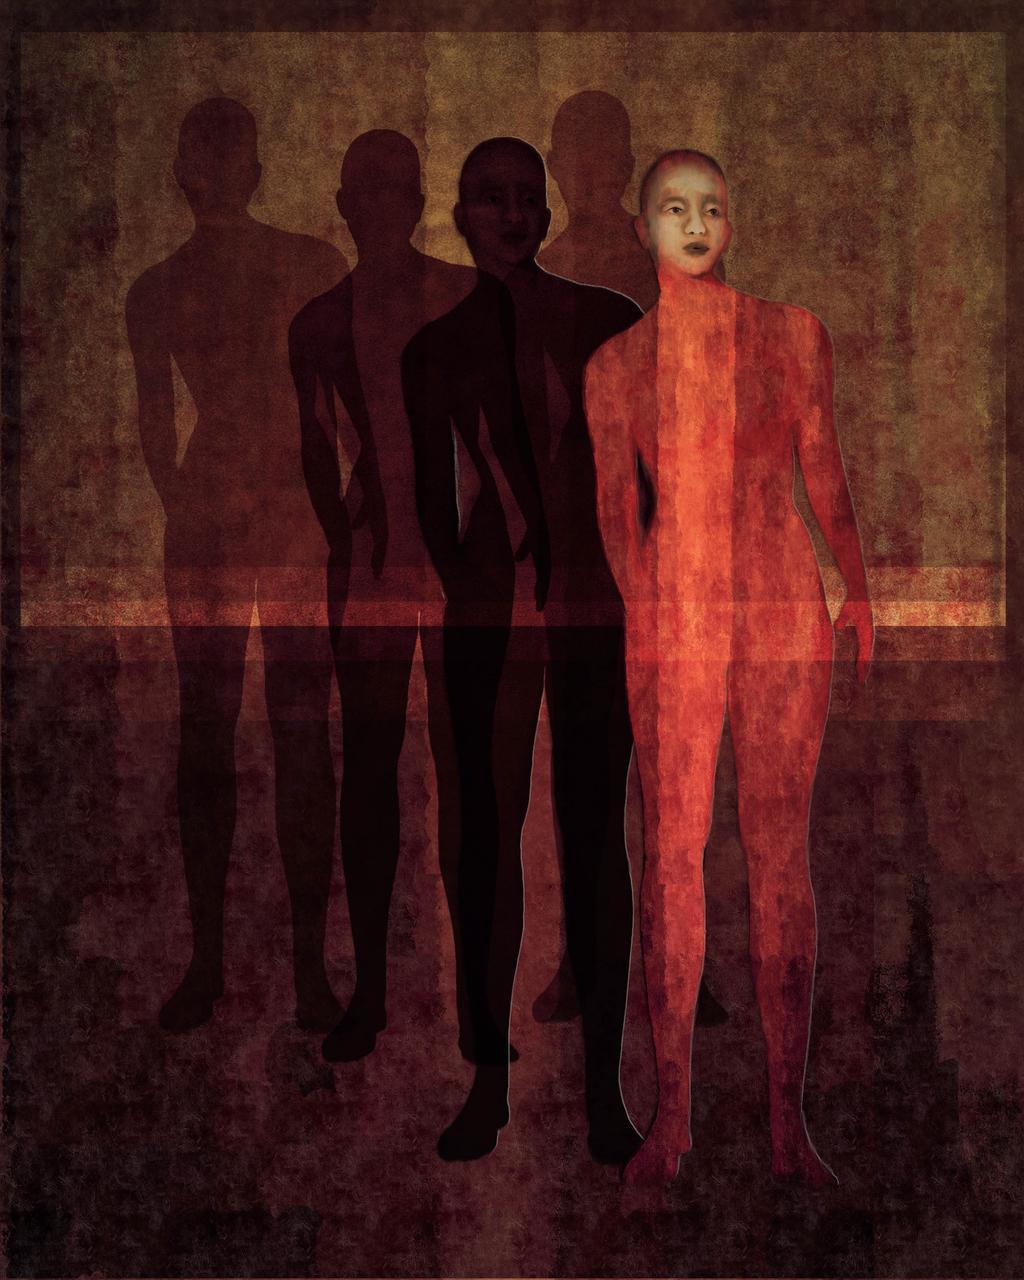 Nine: Digital Painting by Marina Flournoy